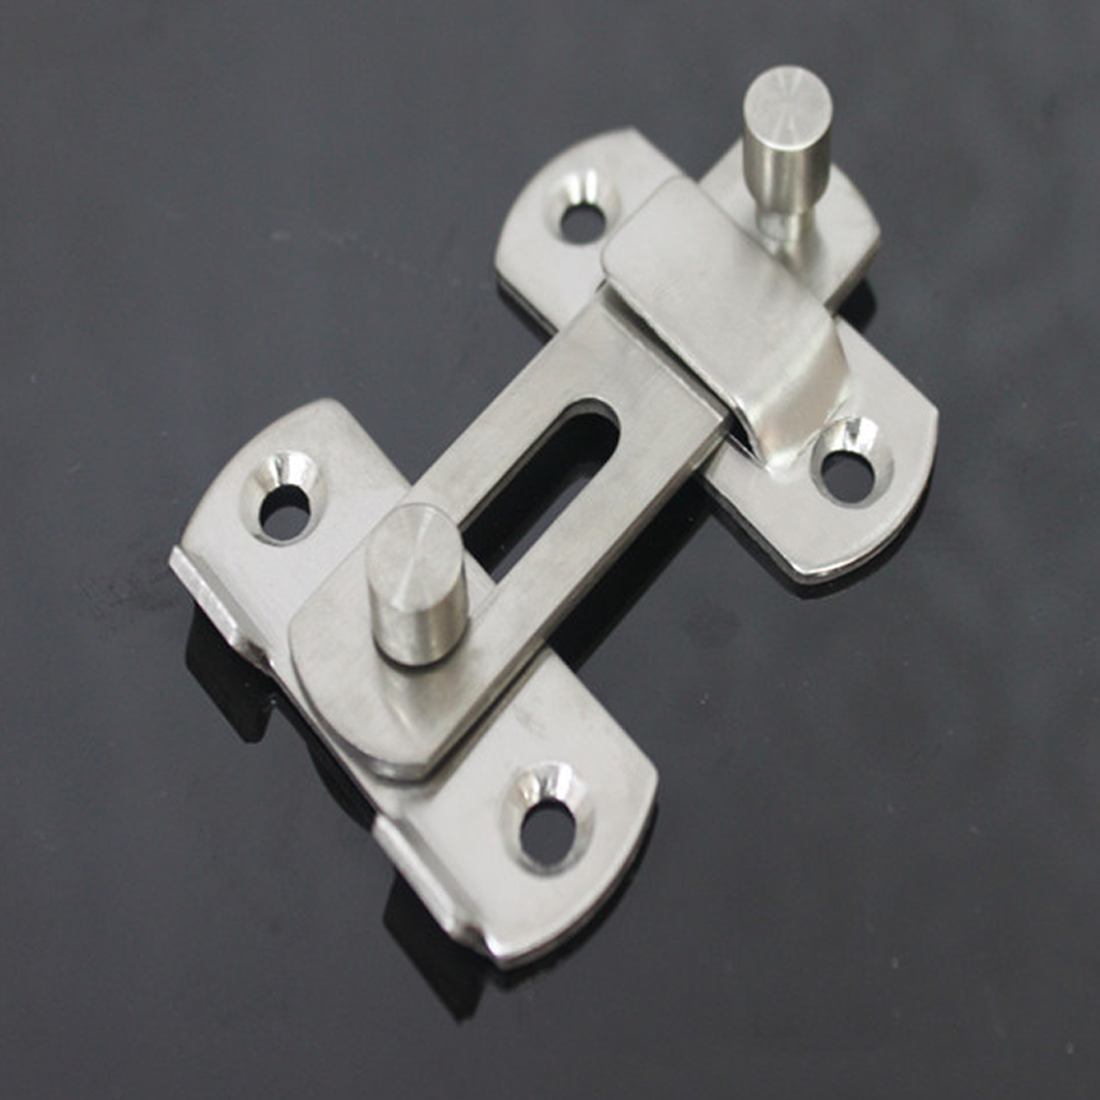 Hot Hasp Latch Stainless Steel Hasp Latch Lock Sliding Door Lock For